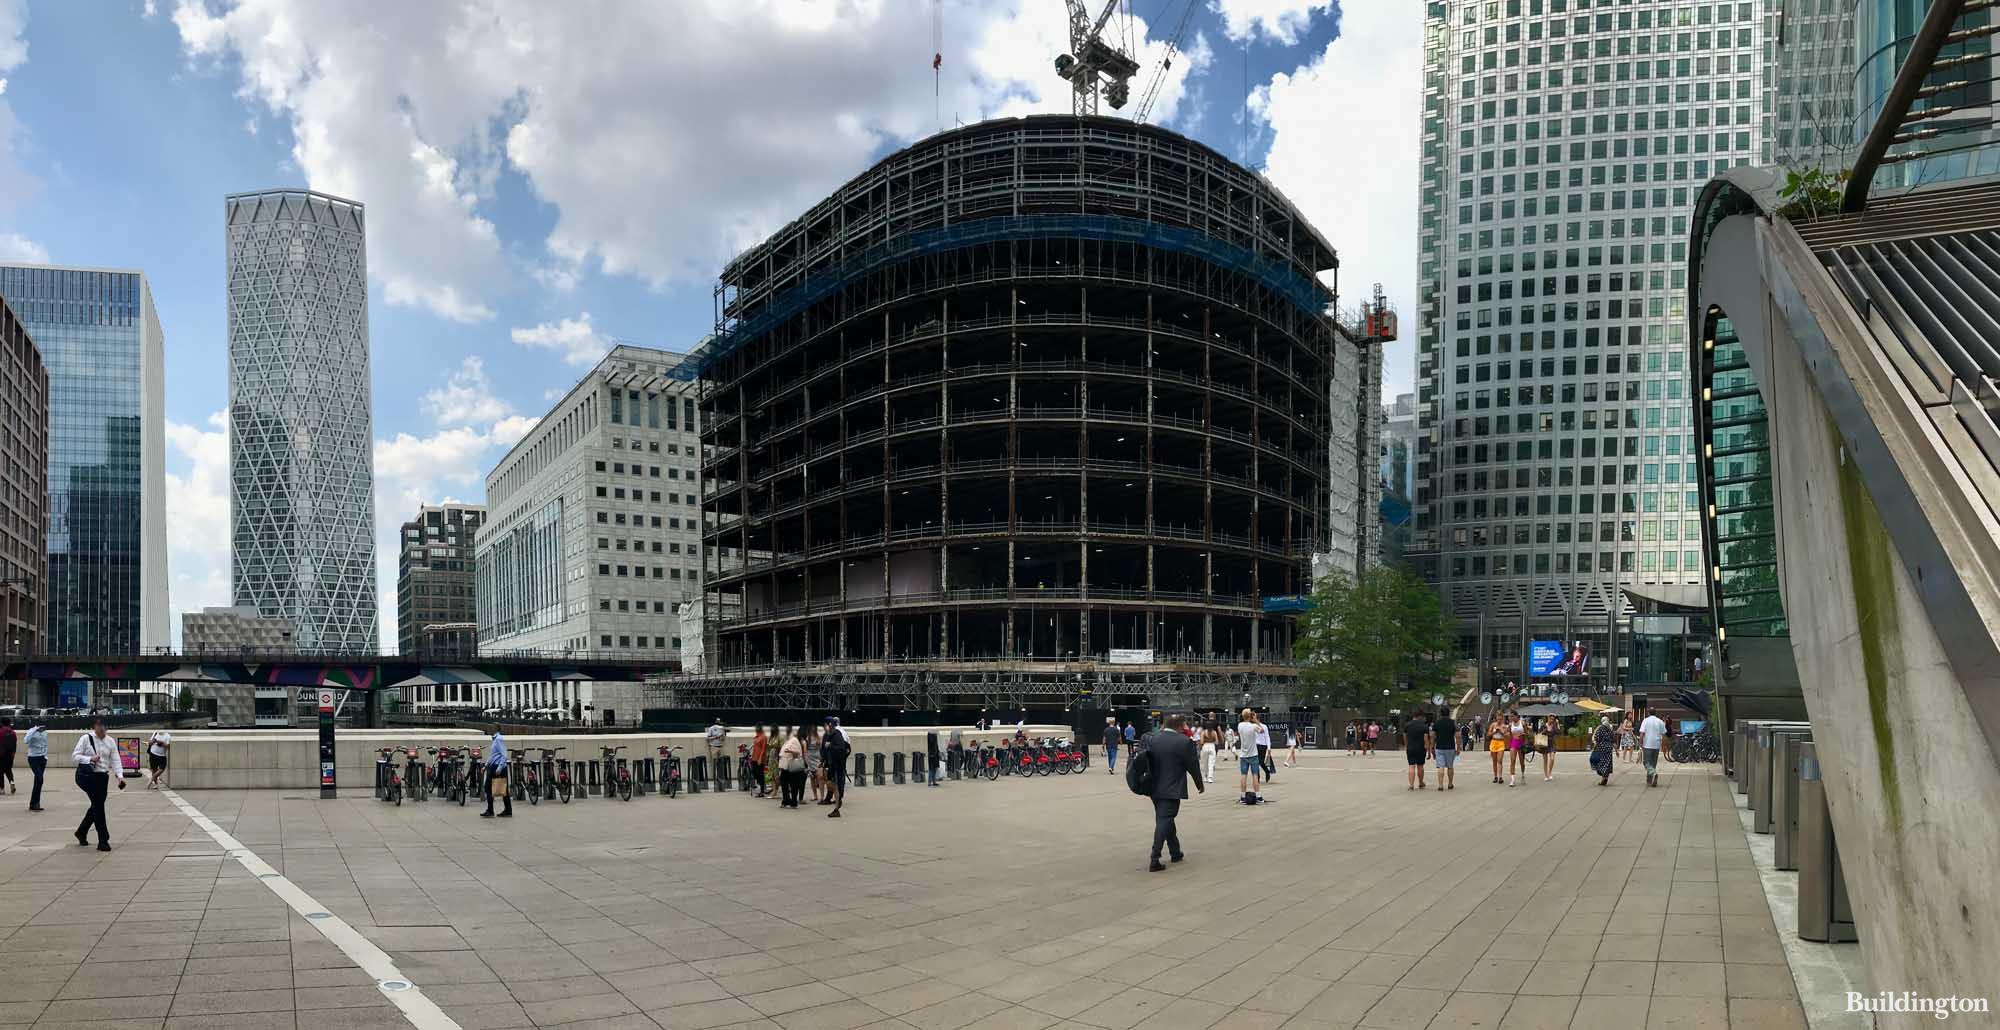 YY London under construction in Canary Wharf, London E14.